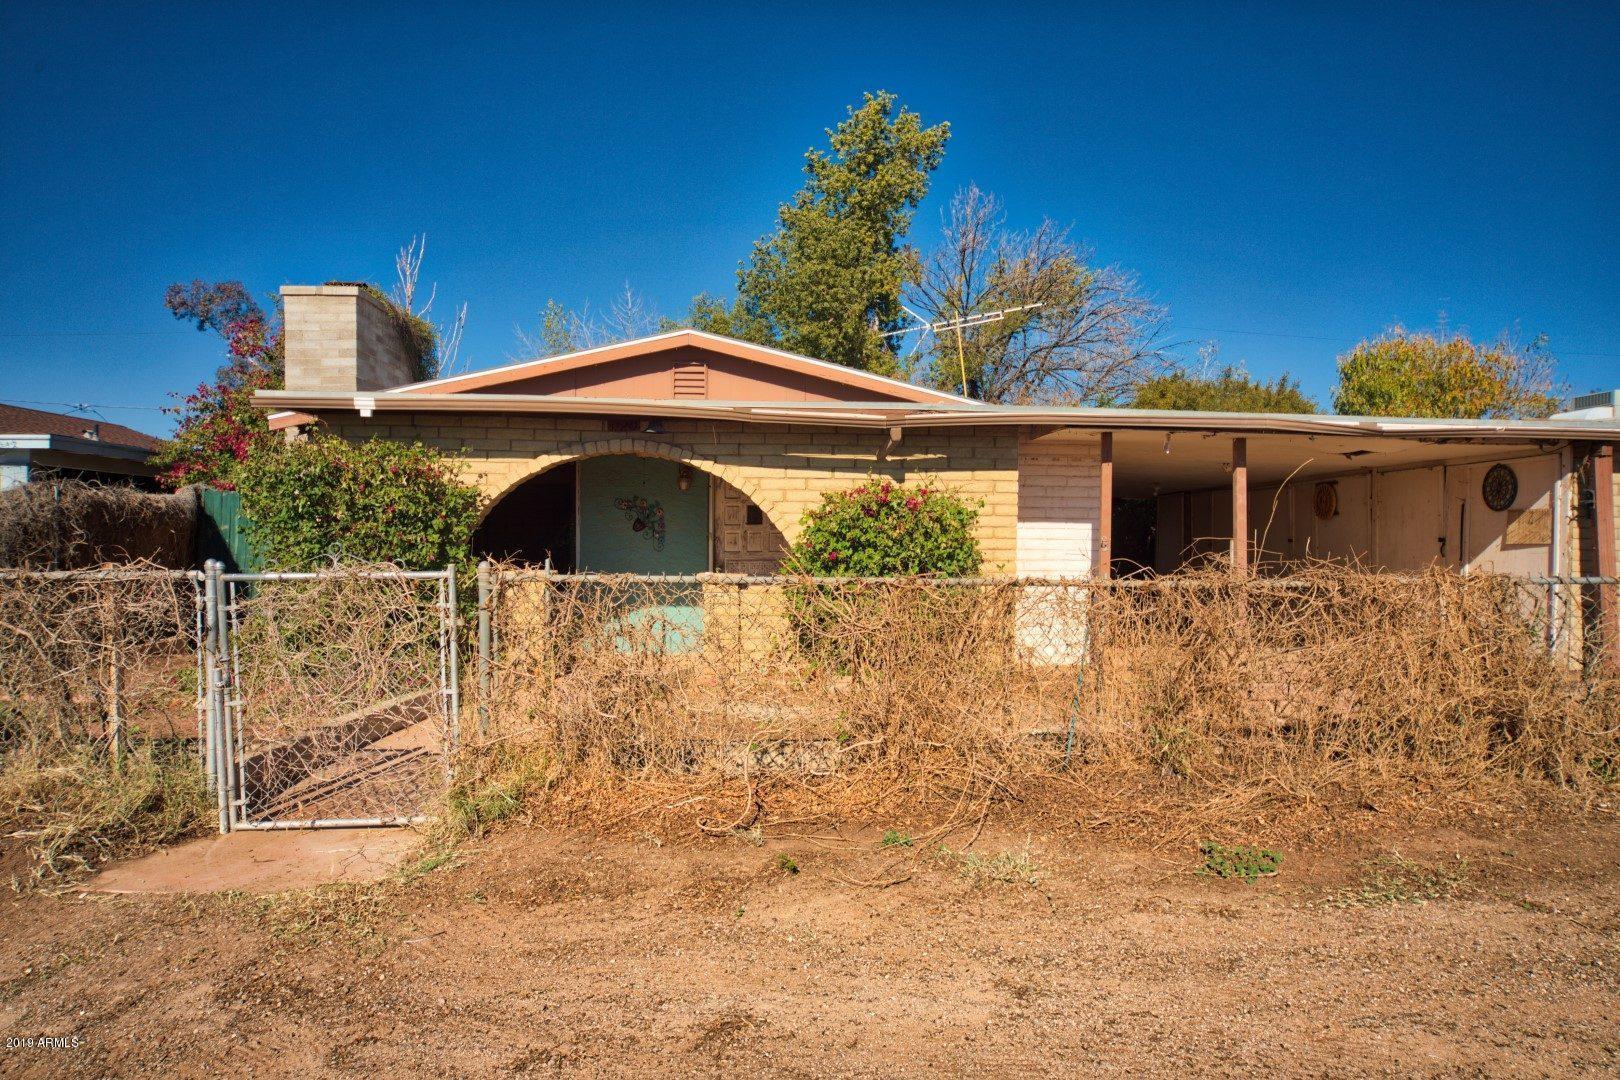 Photo for 1120 E 3rd Street, Casa Grande, AZ 85122 (MLS # 5864604)